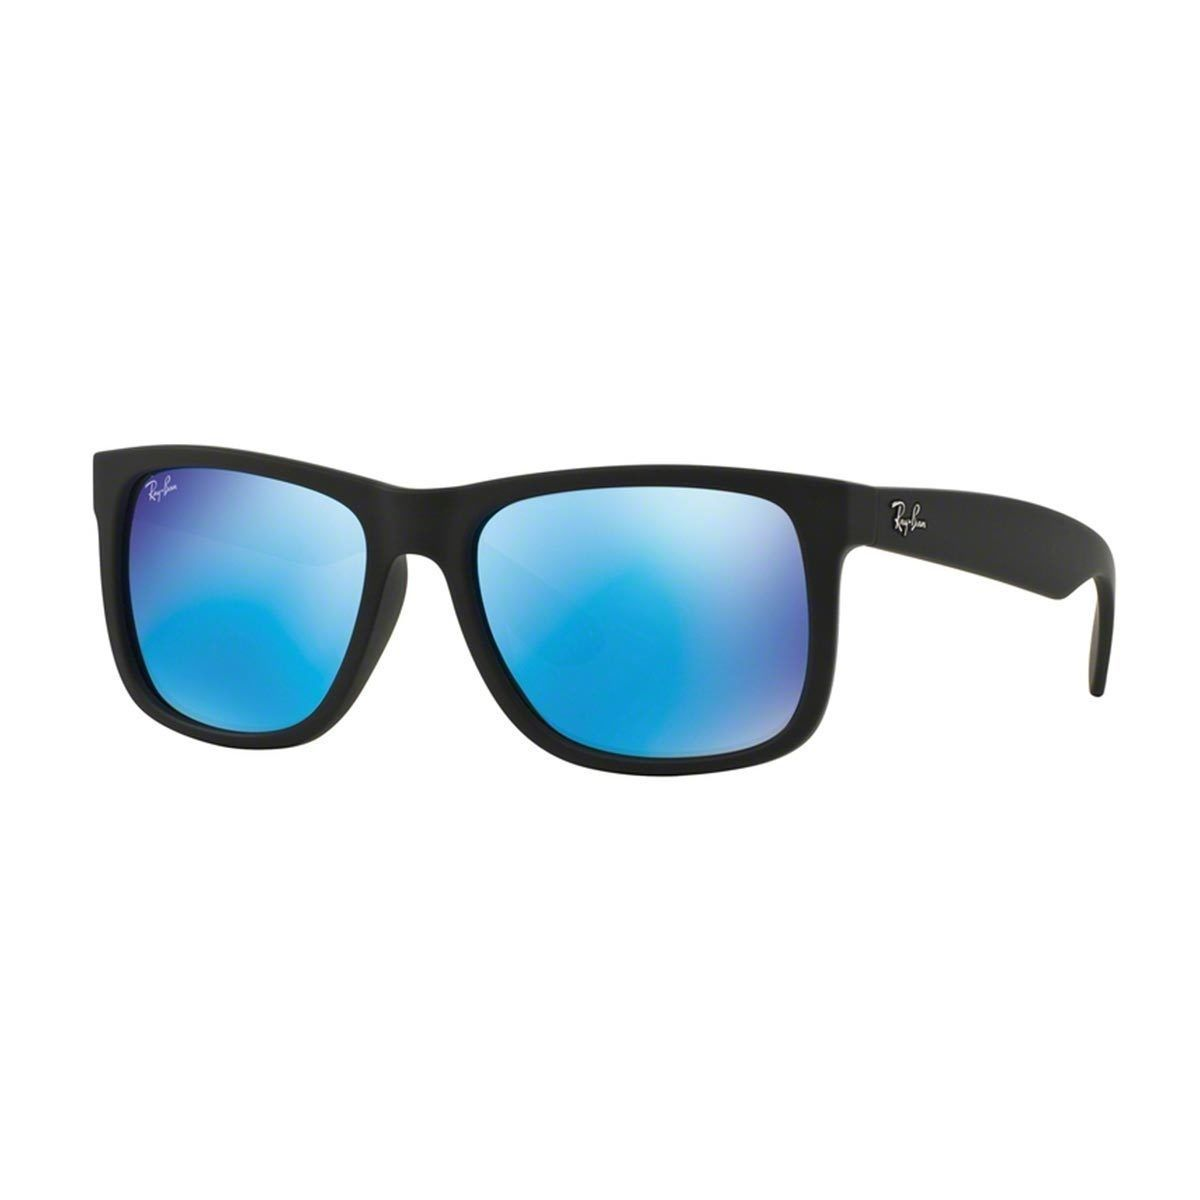 Óculos de Sol Ray Ban Justin Pretocom Lente Azul Espelhada   óculos escuros  masc   Pinterest   Óculos, Oculos de sol e Óculos escuros 1d5e0b5843